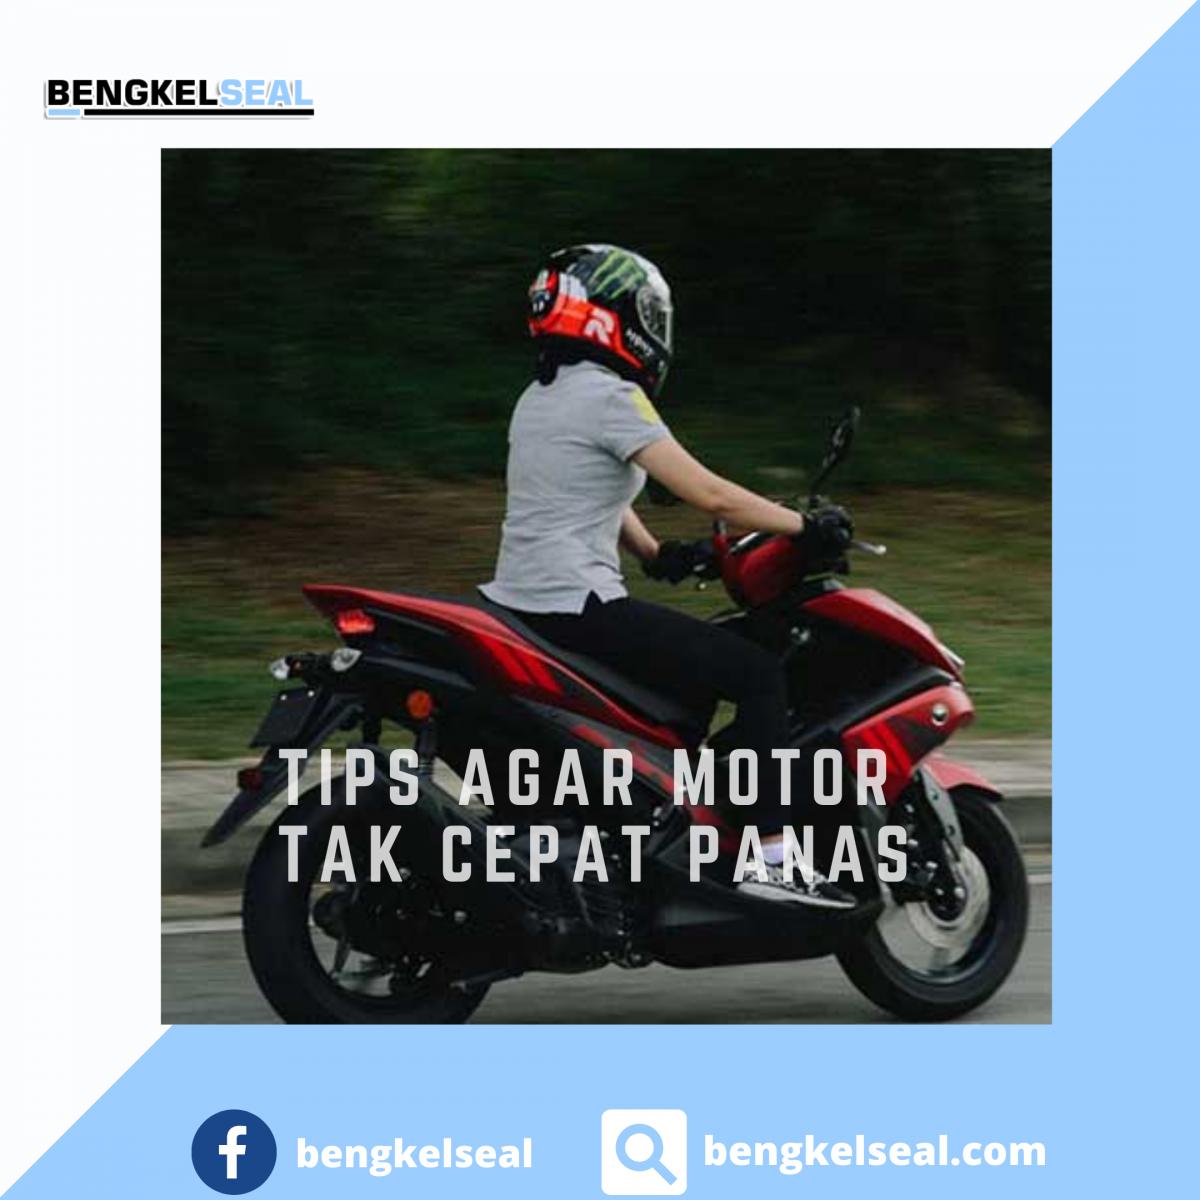 bgklseal27-1200x1200.png